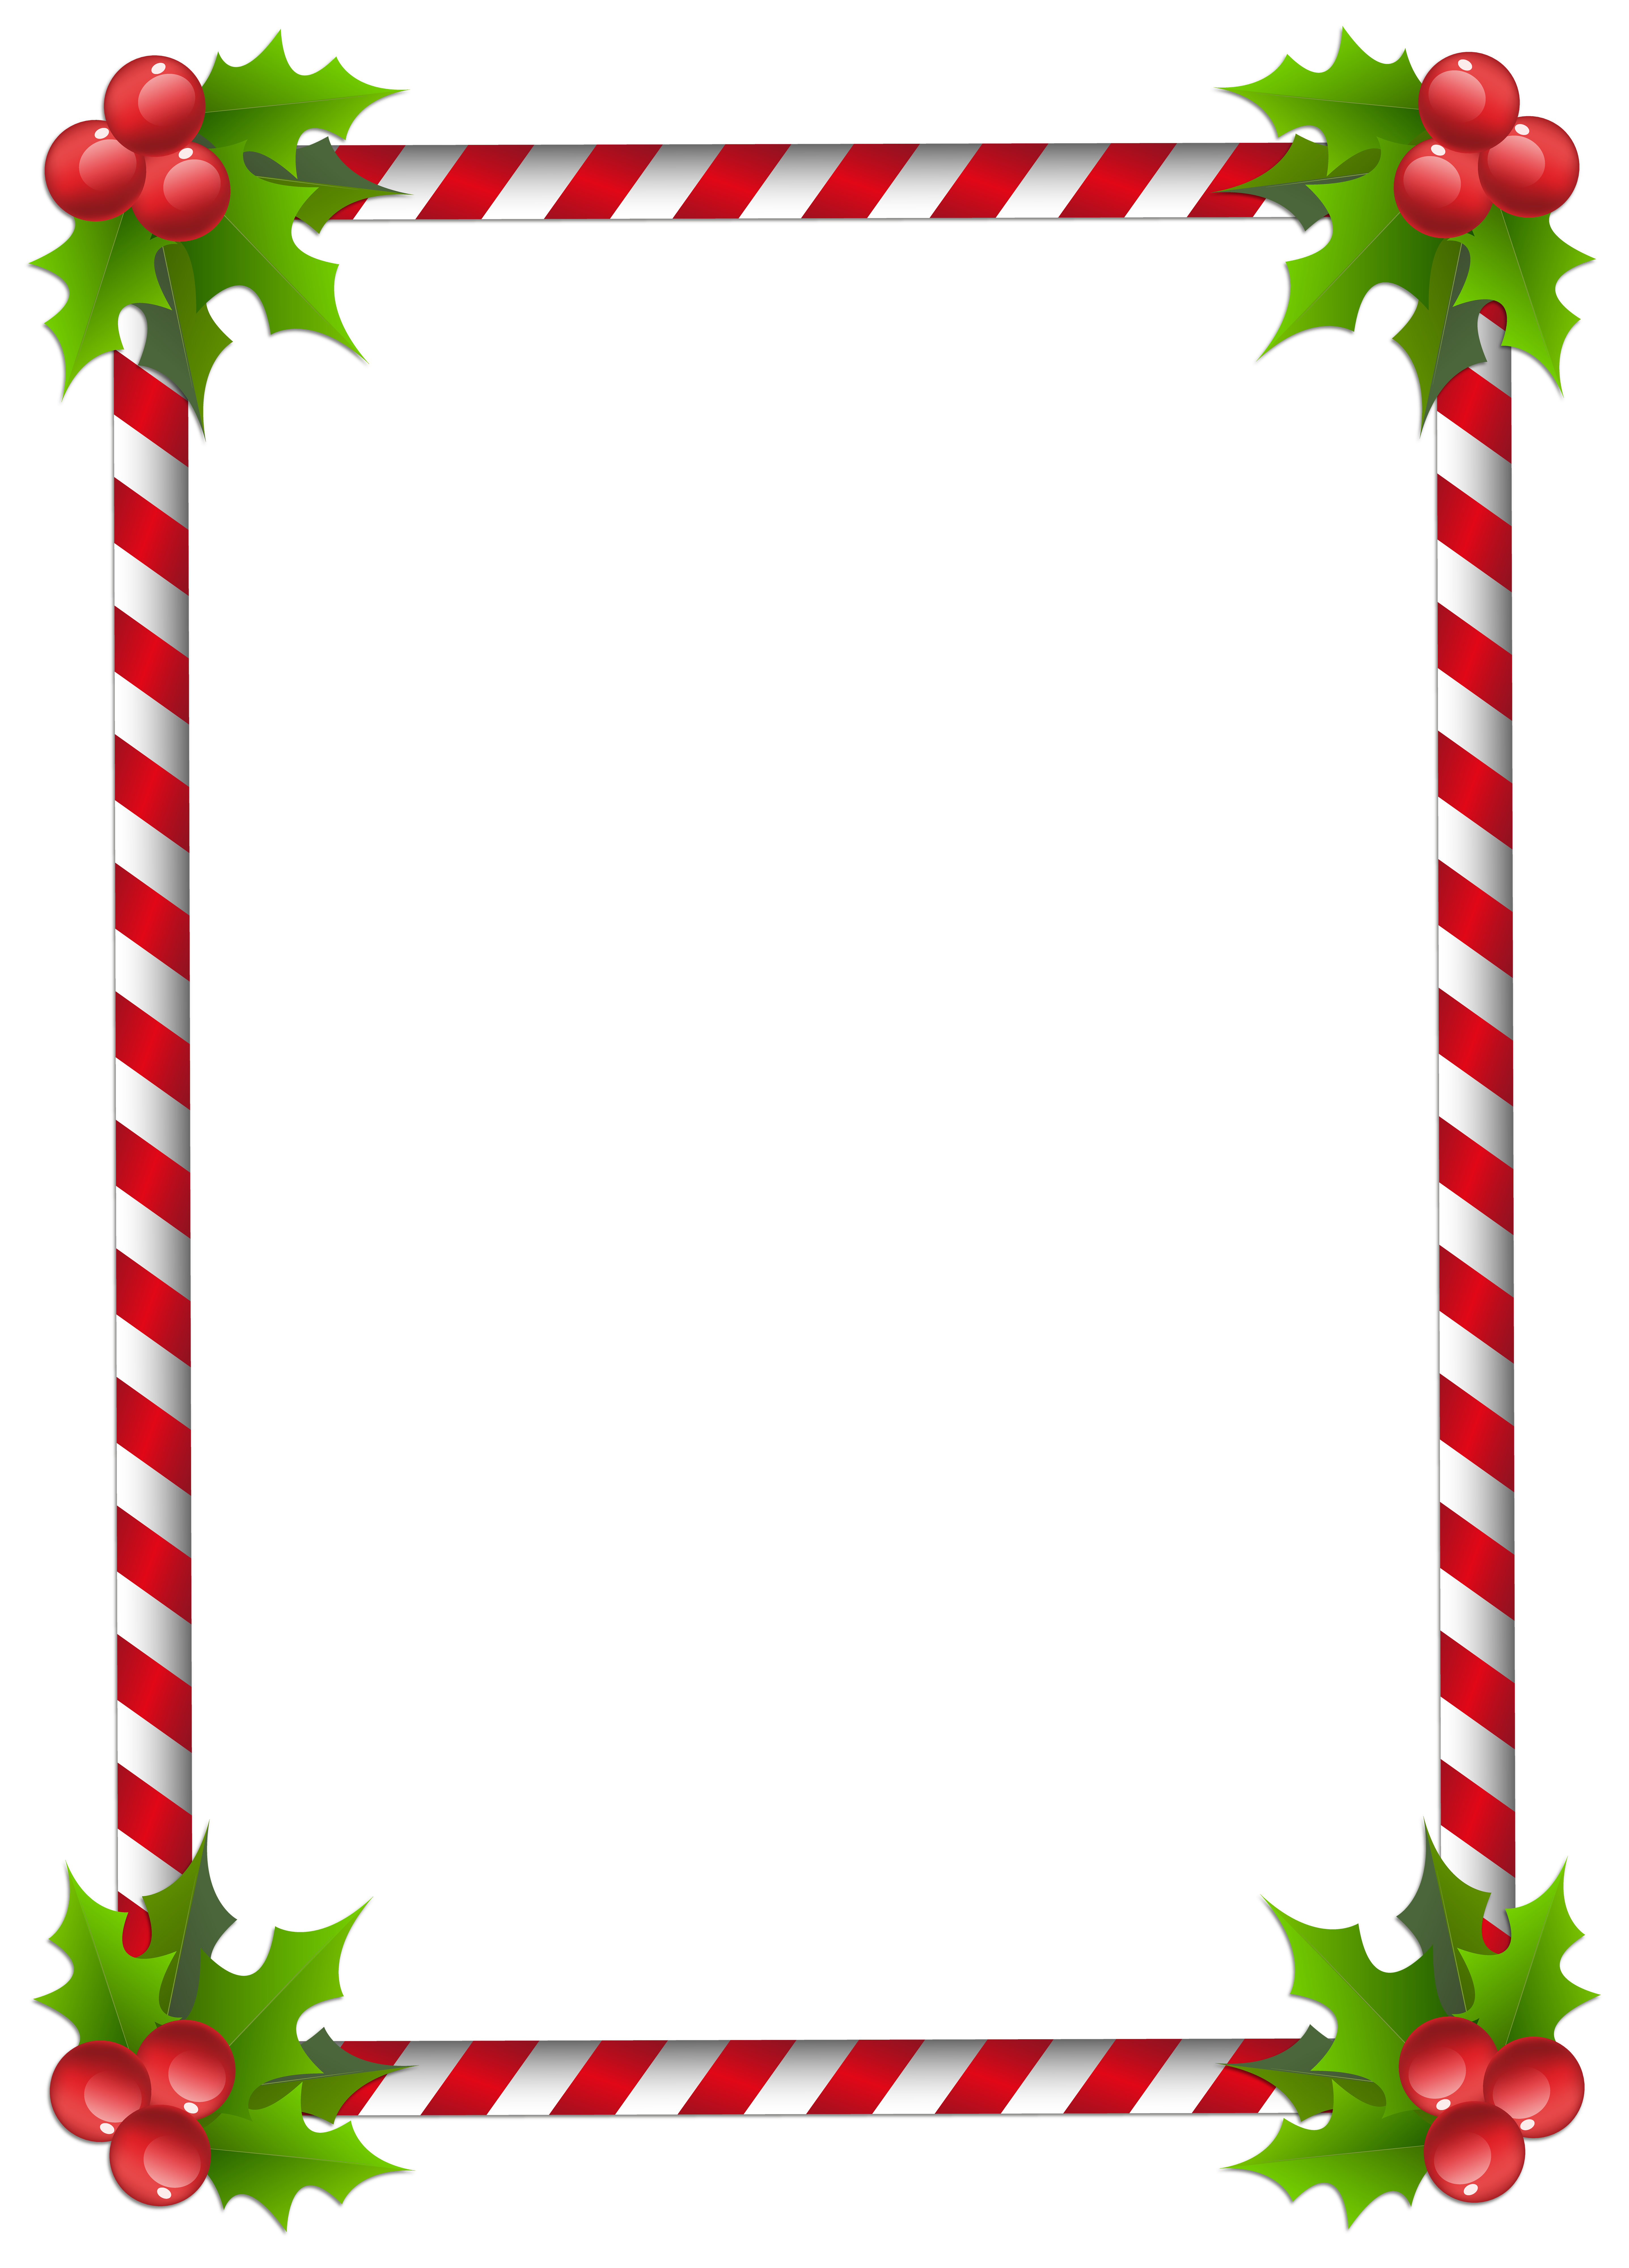 discover ideas about frame border design [ 5746 x 8000 Pixel ]